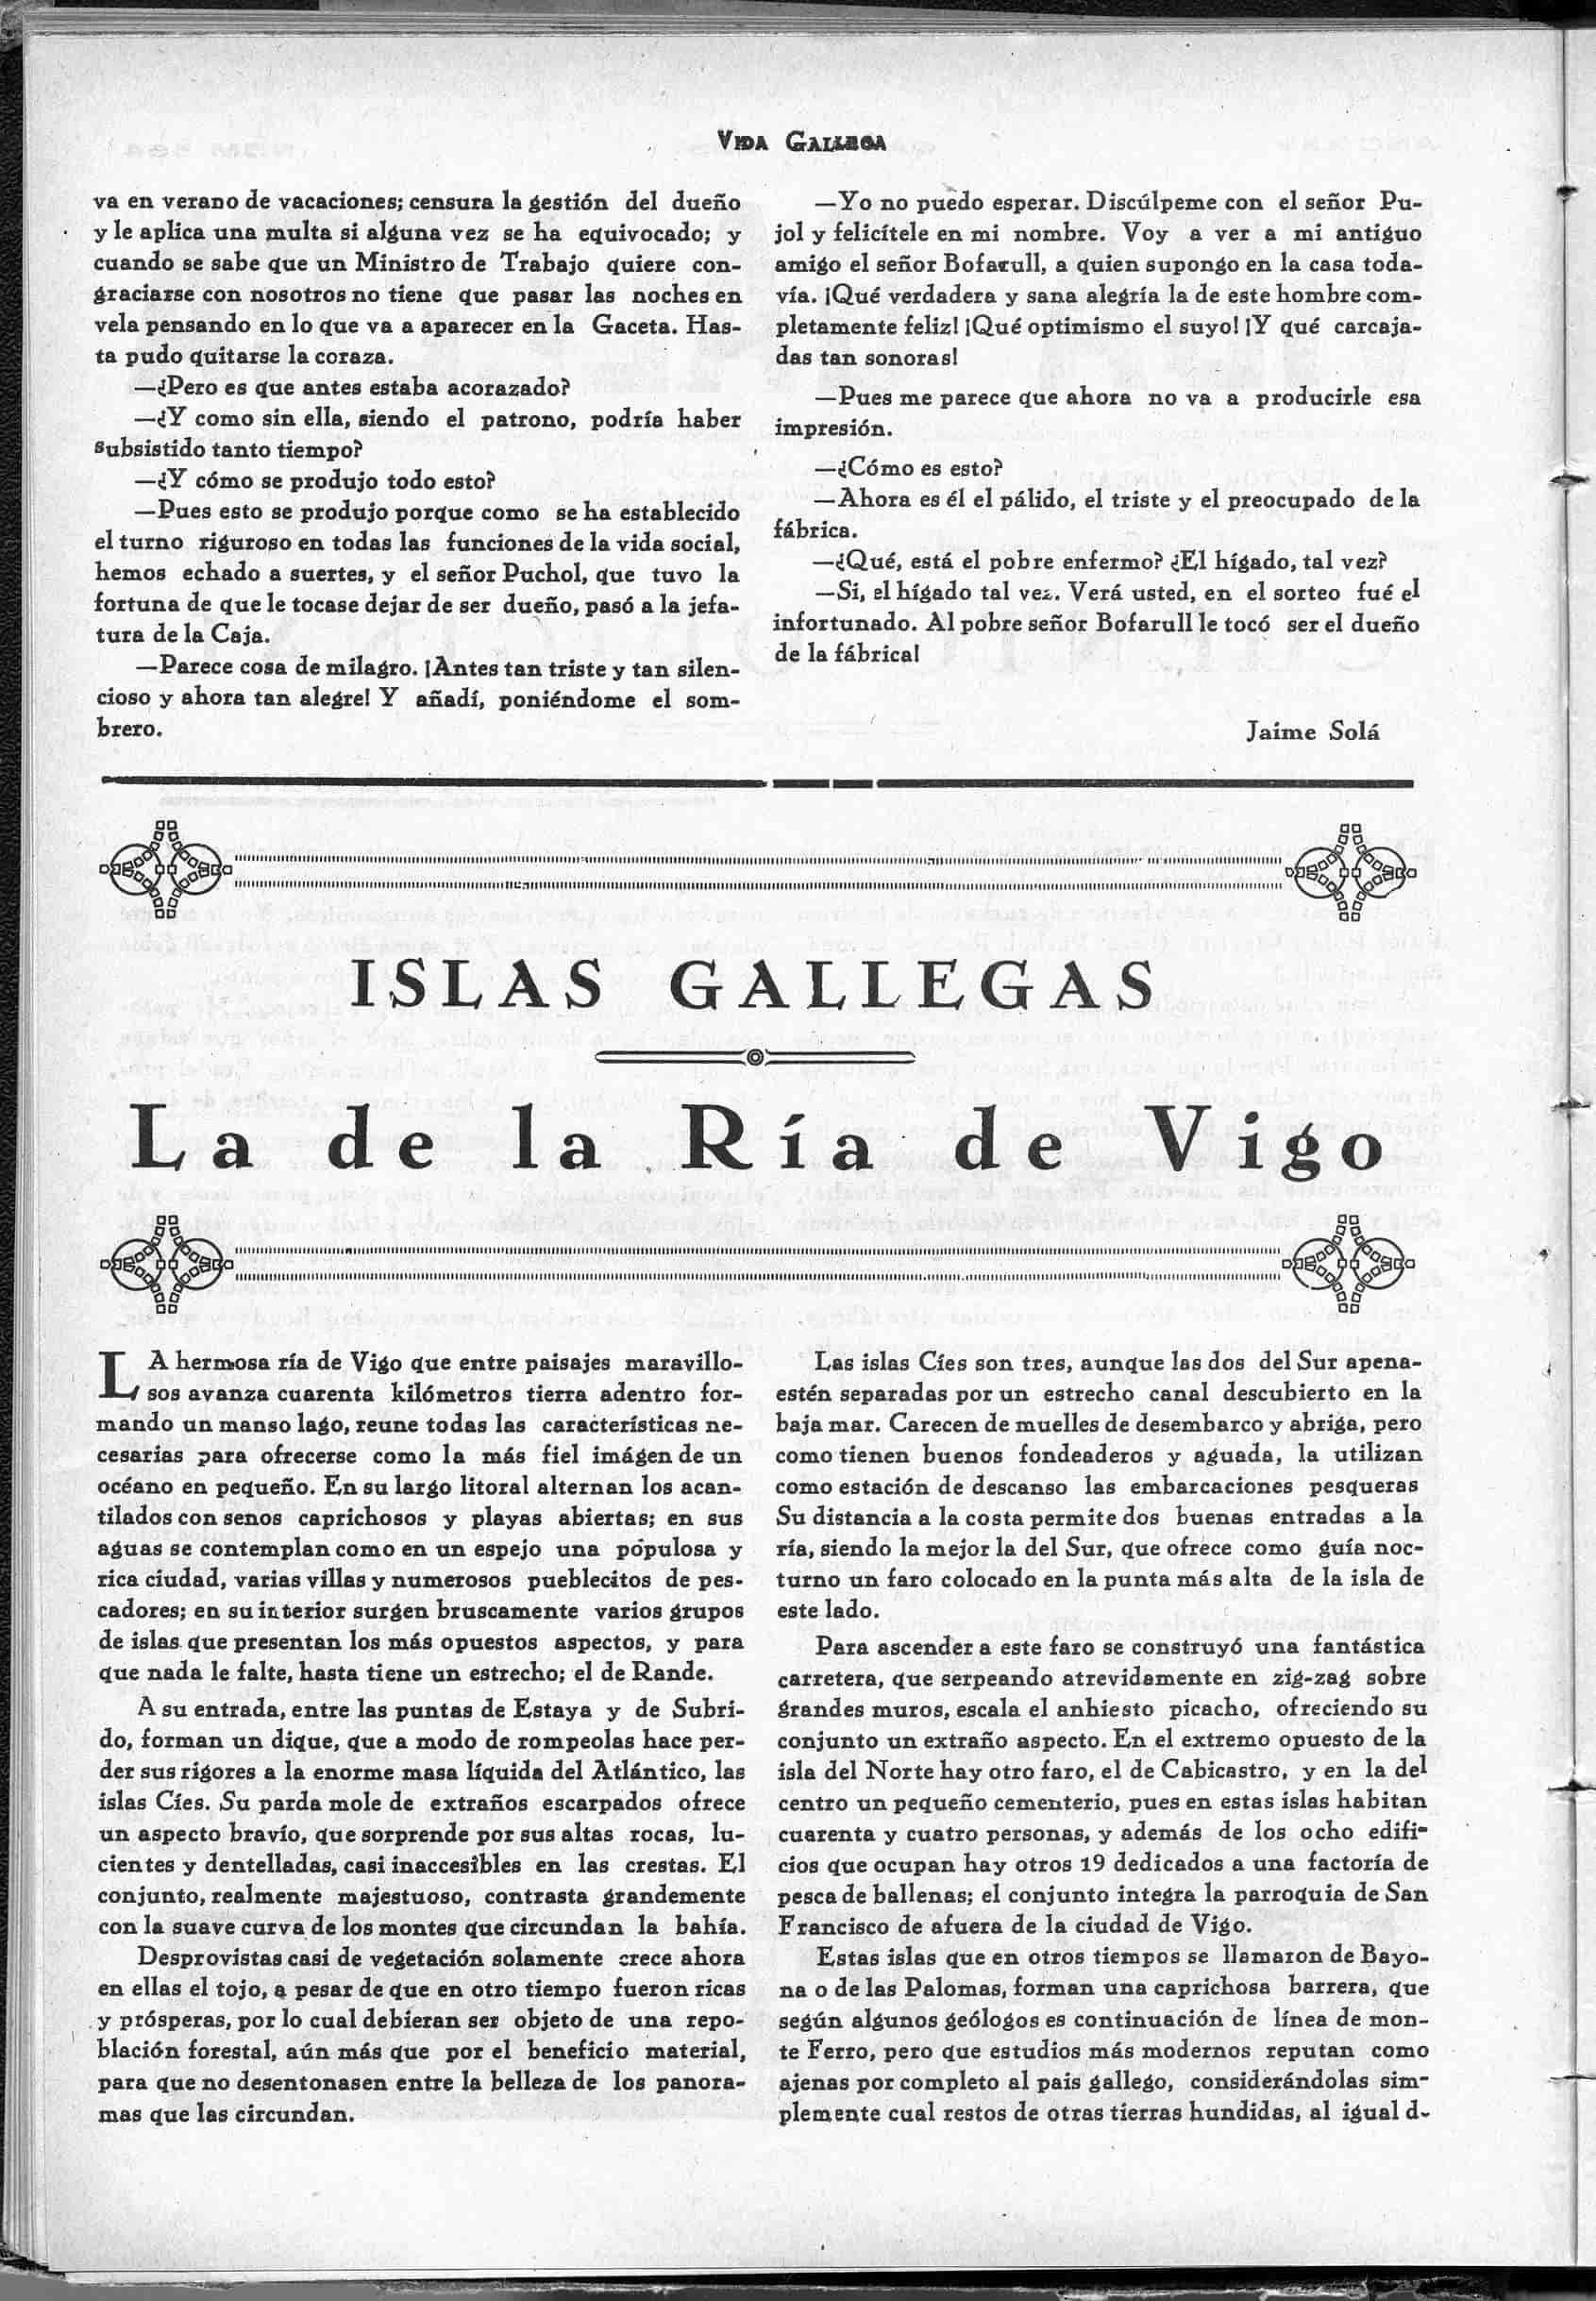 prensa_1038 (2)-min